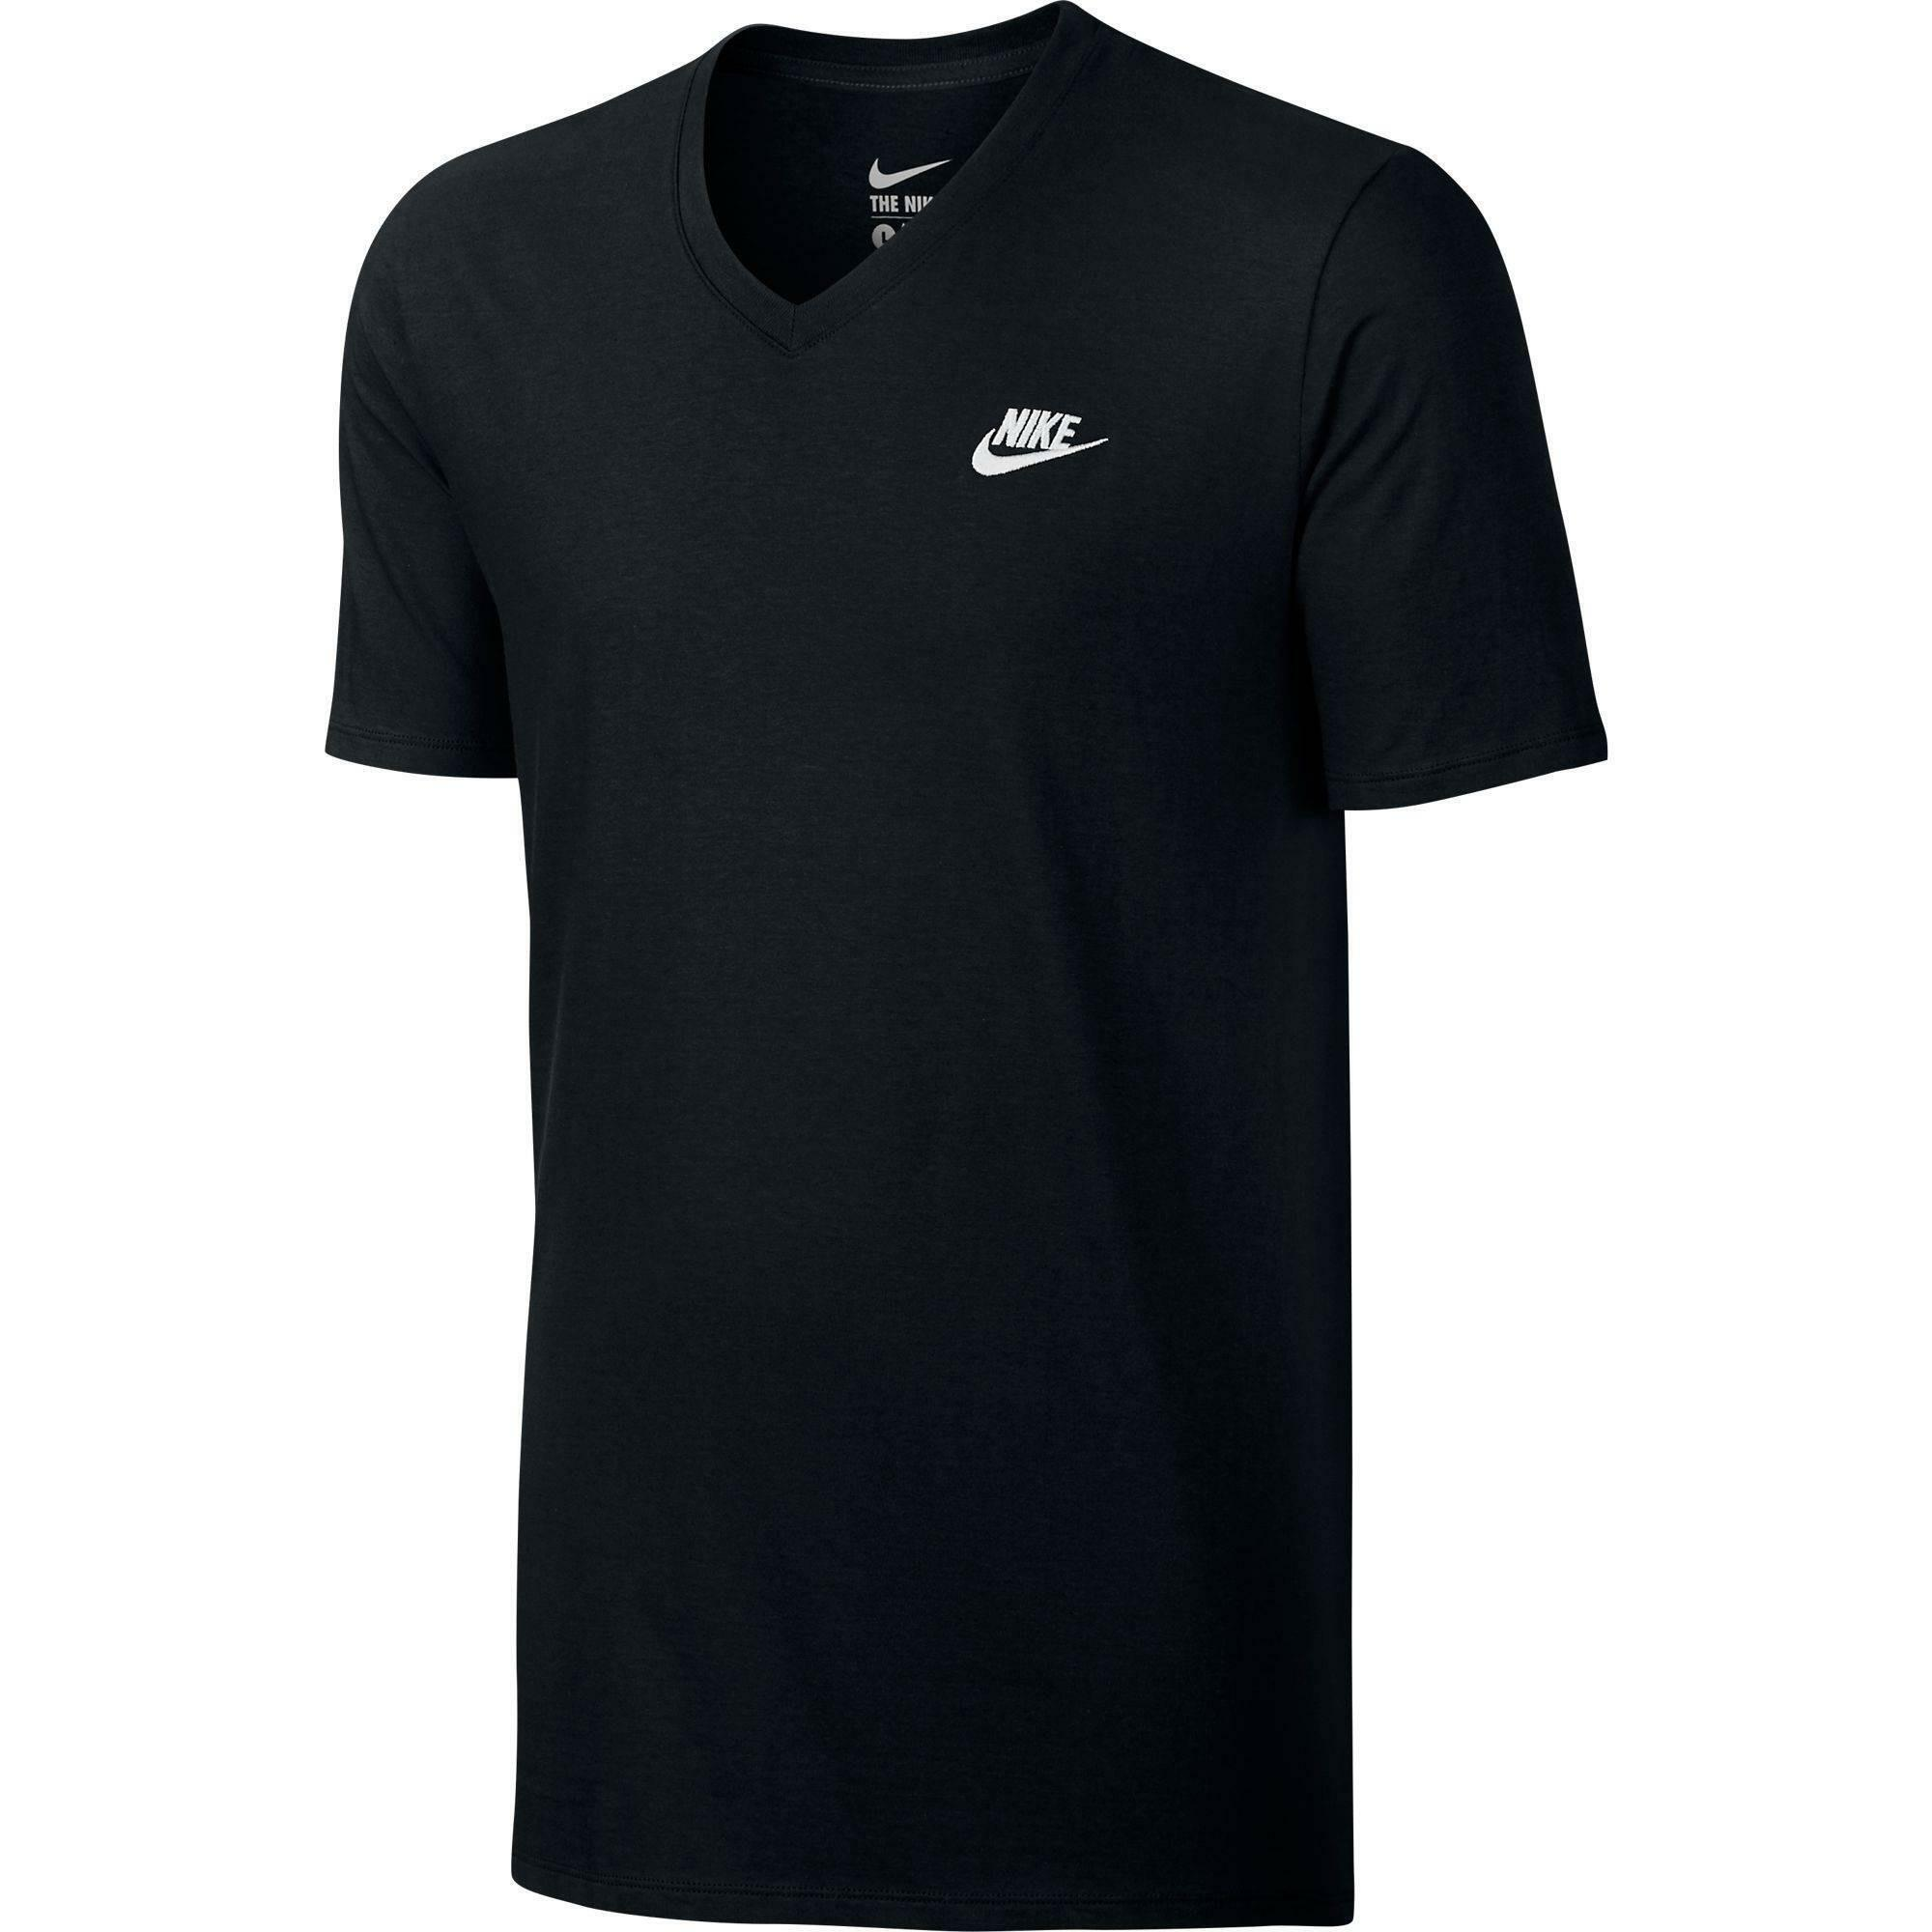 nike nike men's v-neck club embroidered swoosh t-shirt uomo cotone nera